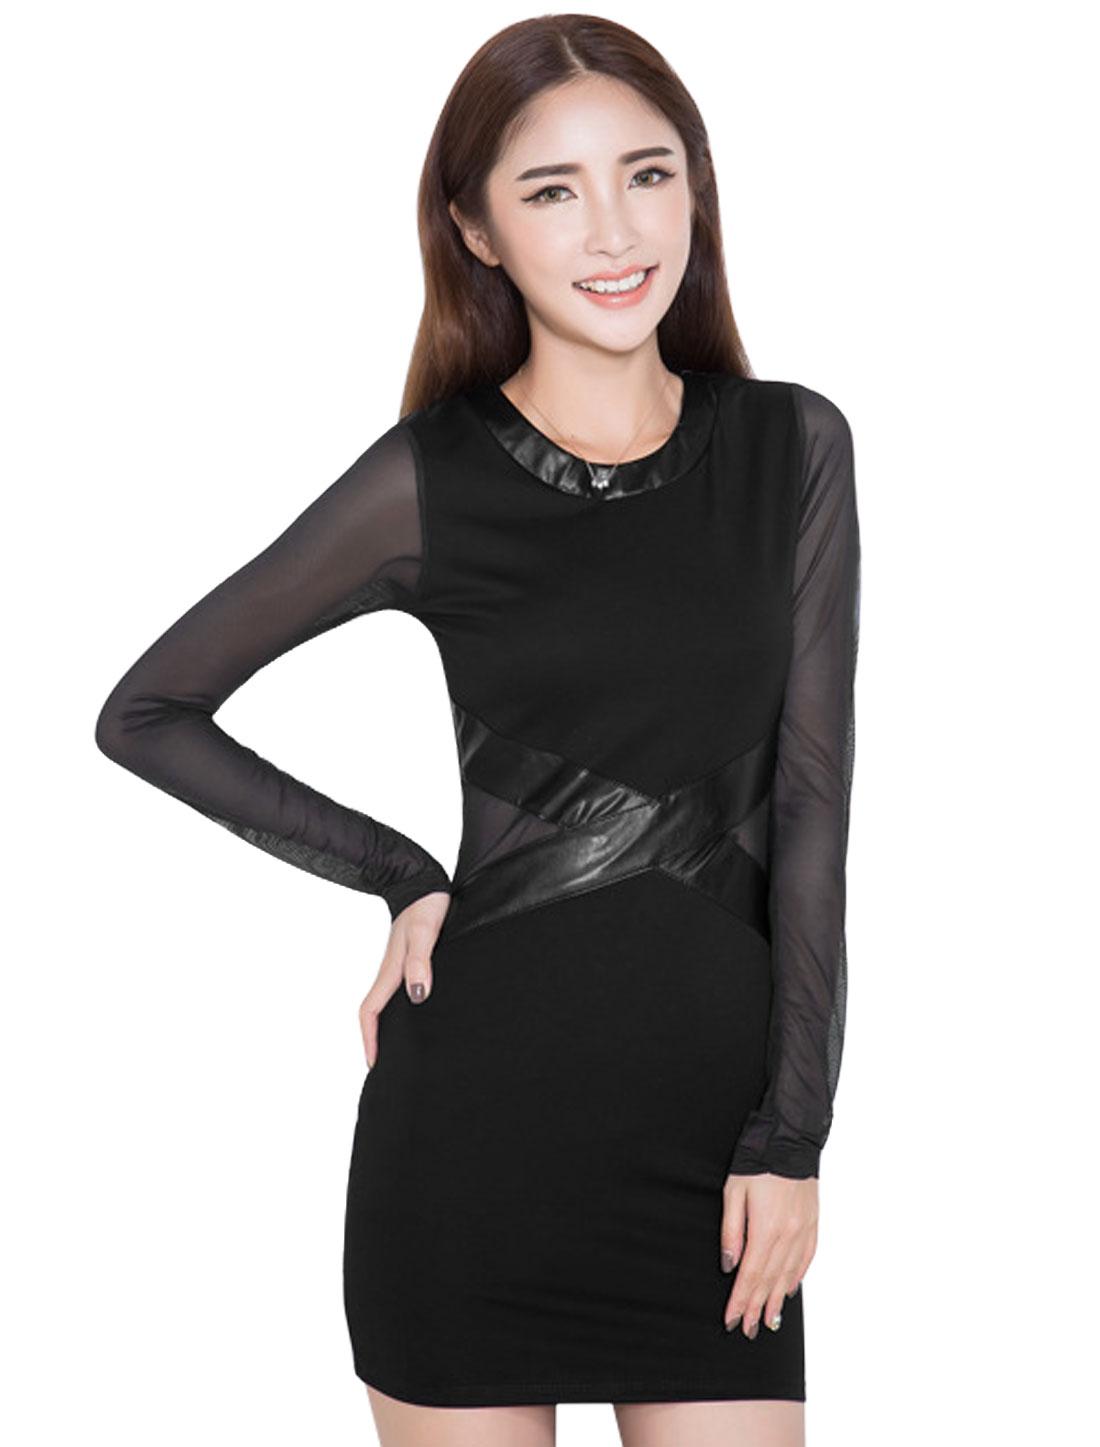 Ladies Black Pullover Pu Mesh Splice Long Sleeves Leisure Sheath Dress S